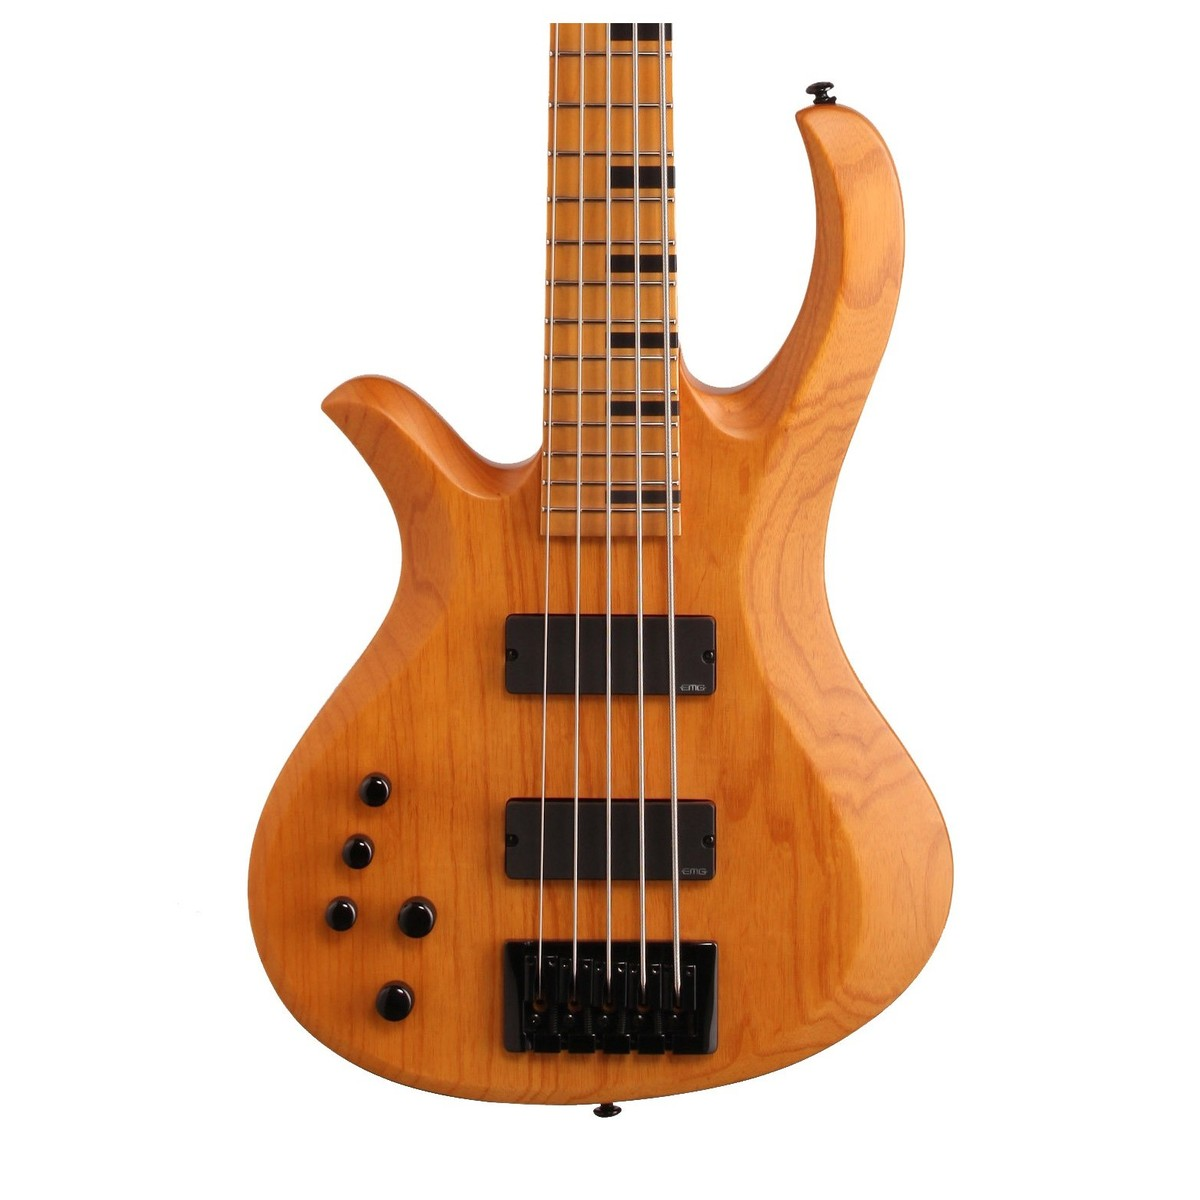 schecter riot session 5 left handed bass guitar aged natural satin at gear4music. Black Bedroom Furniture Sets. Home Design Ideas